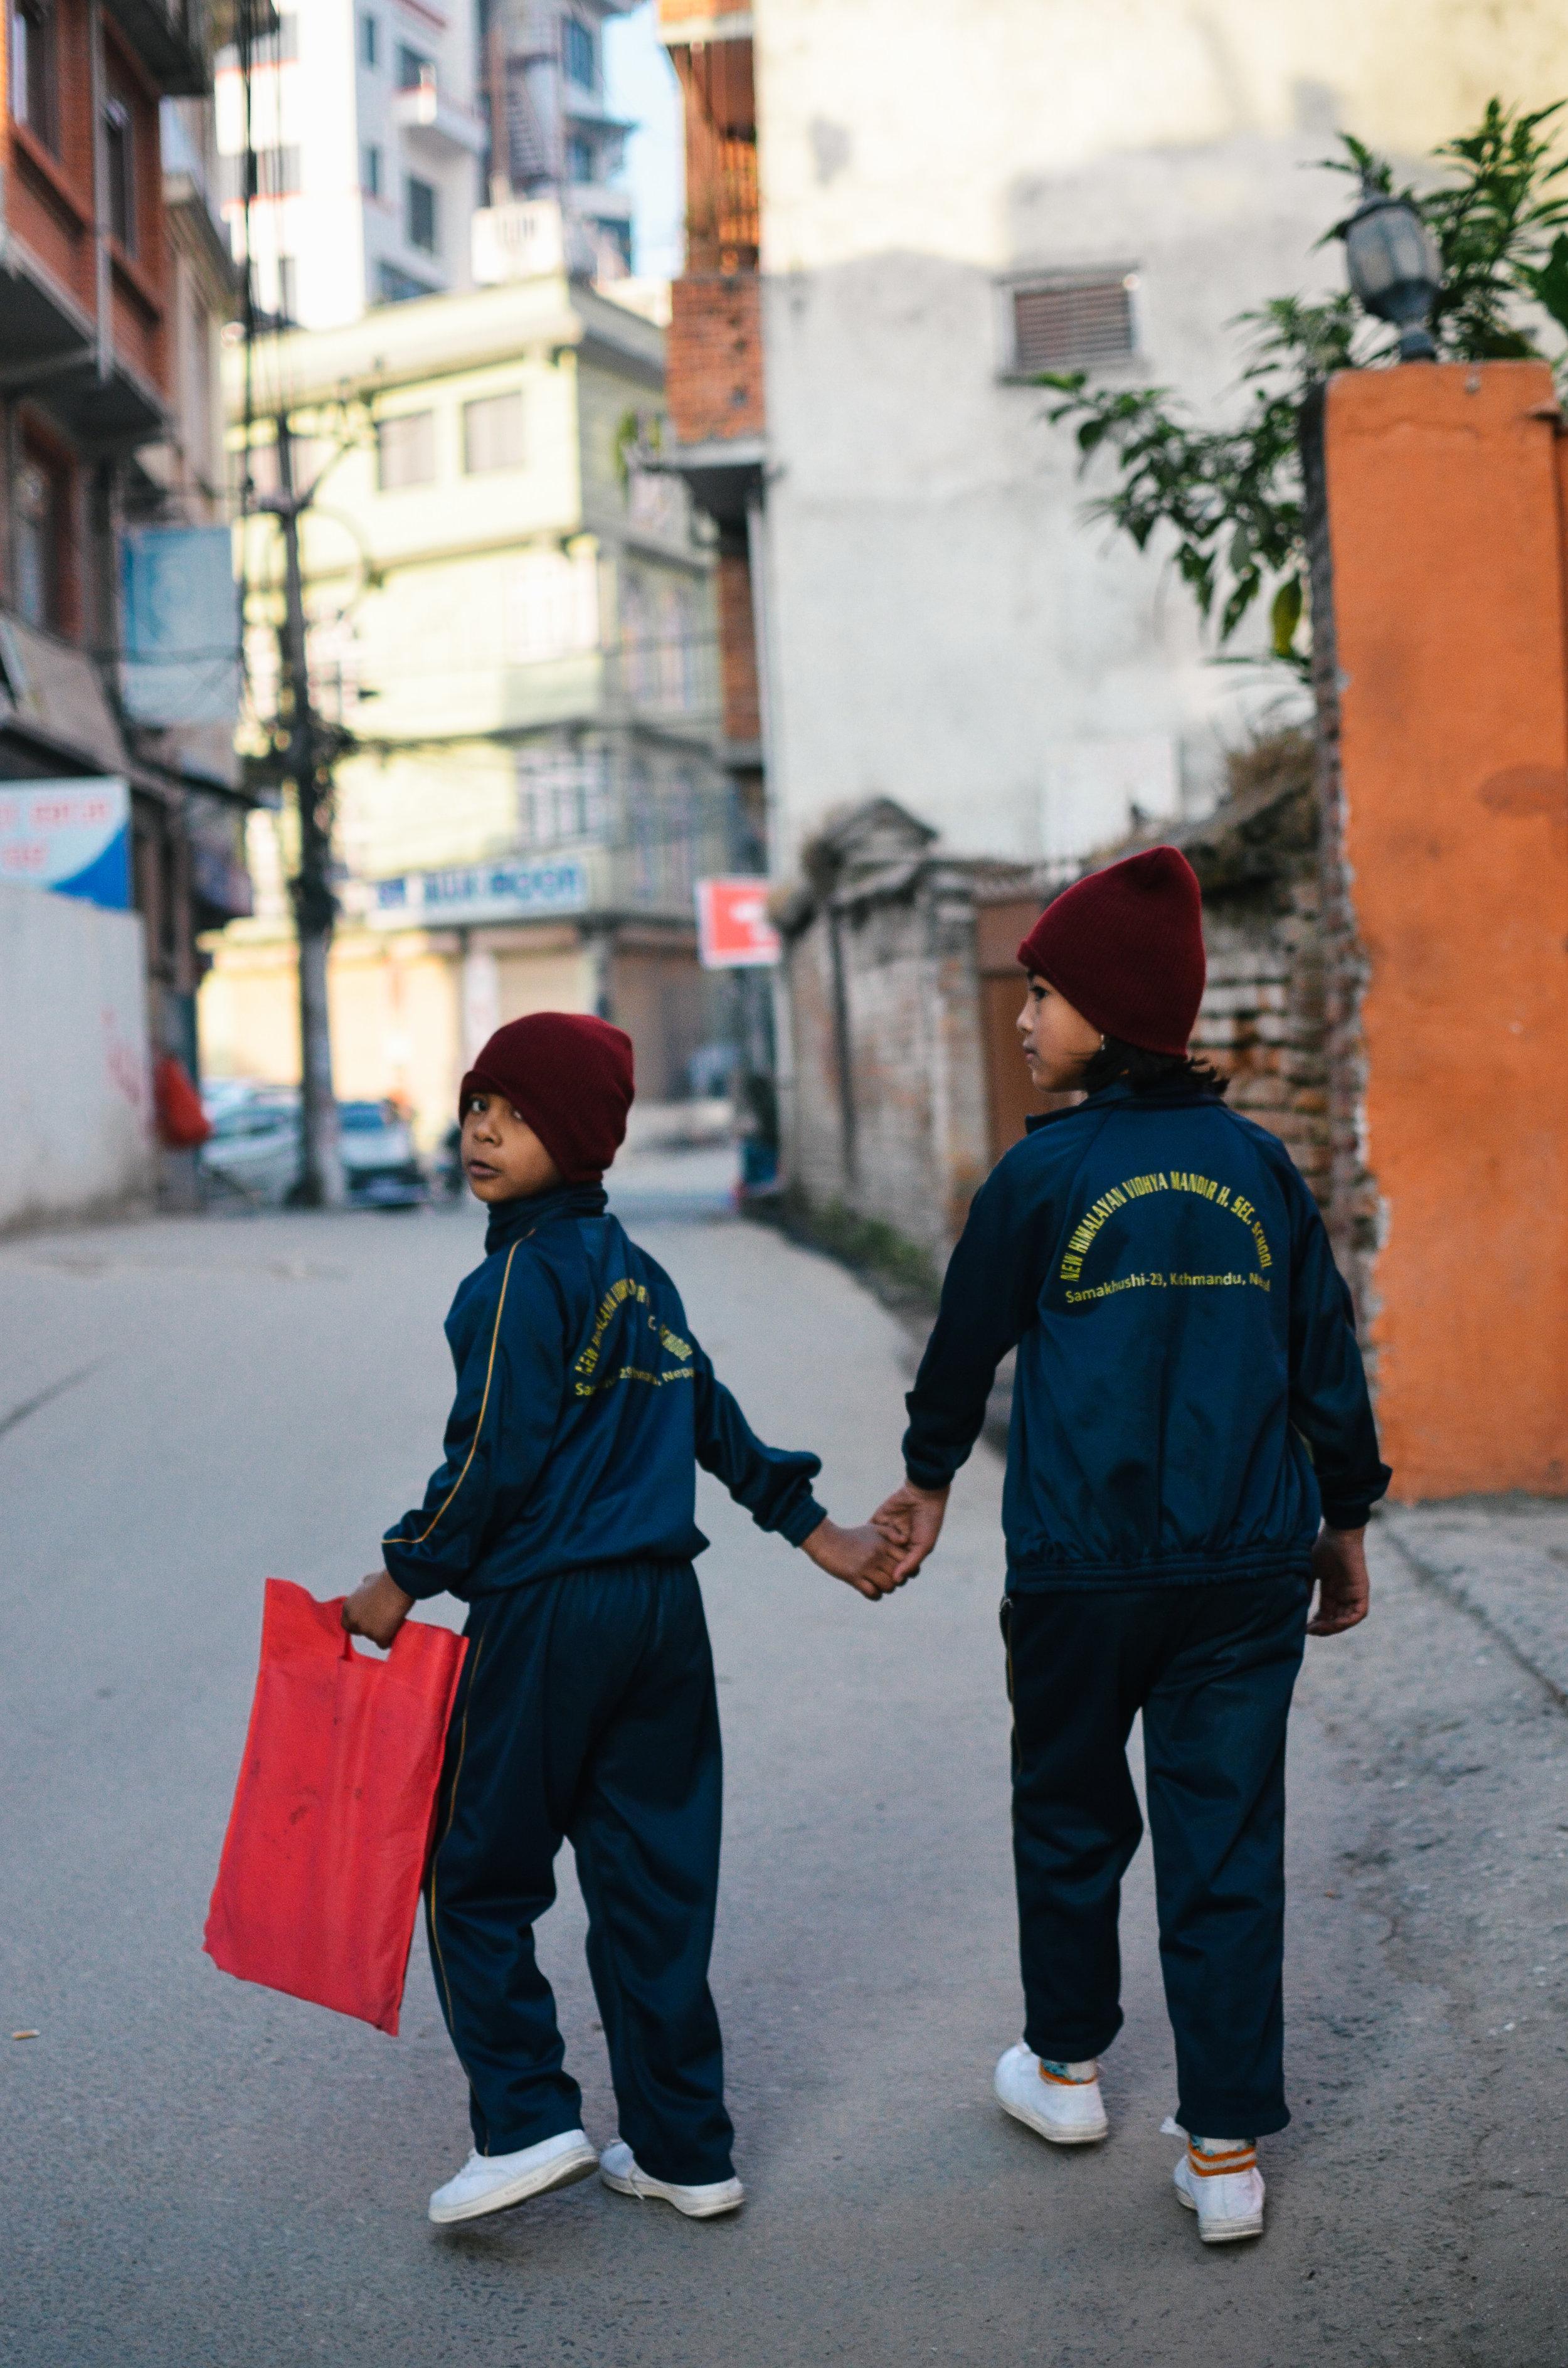 10-things-to-know-kathmandu-nepal-lifeonpine_DSC_0521.jpg